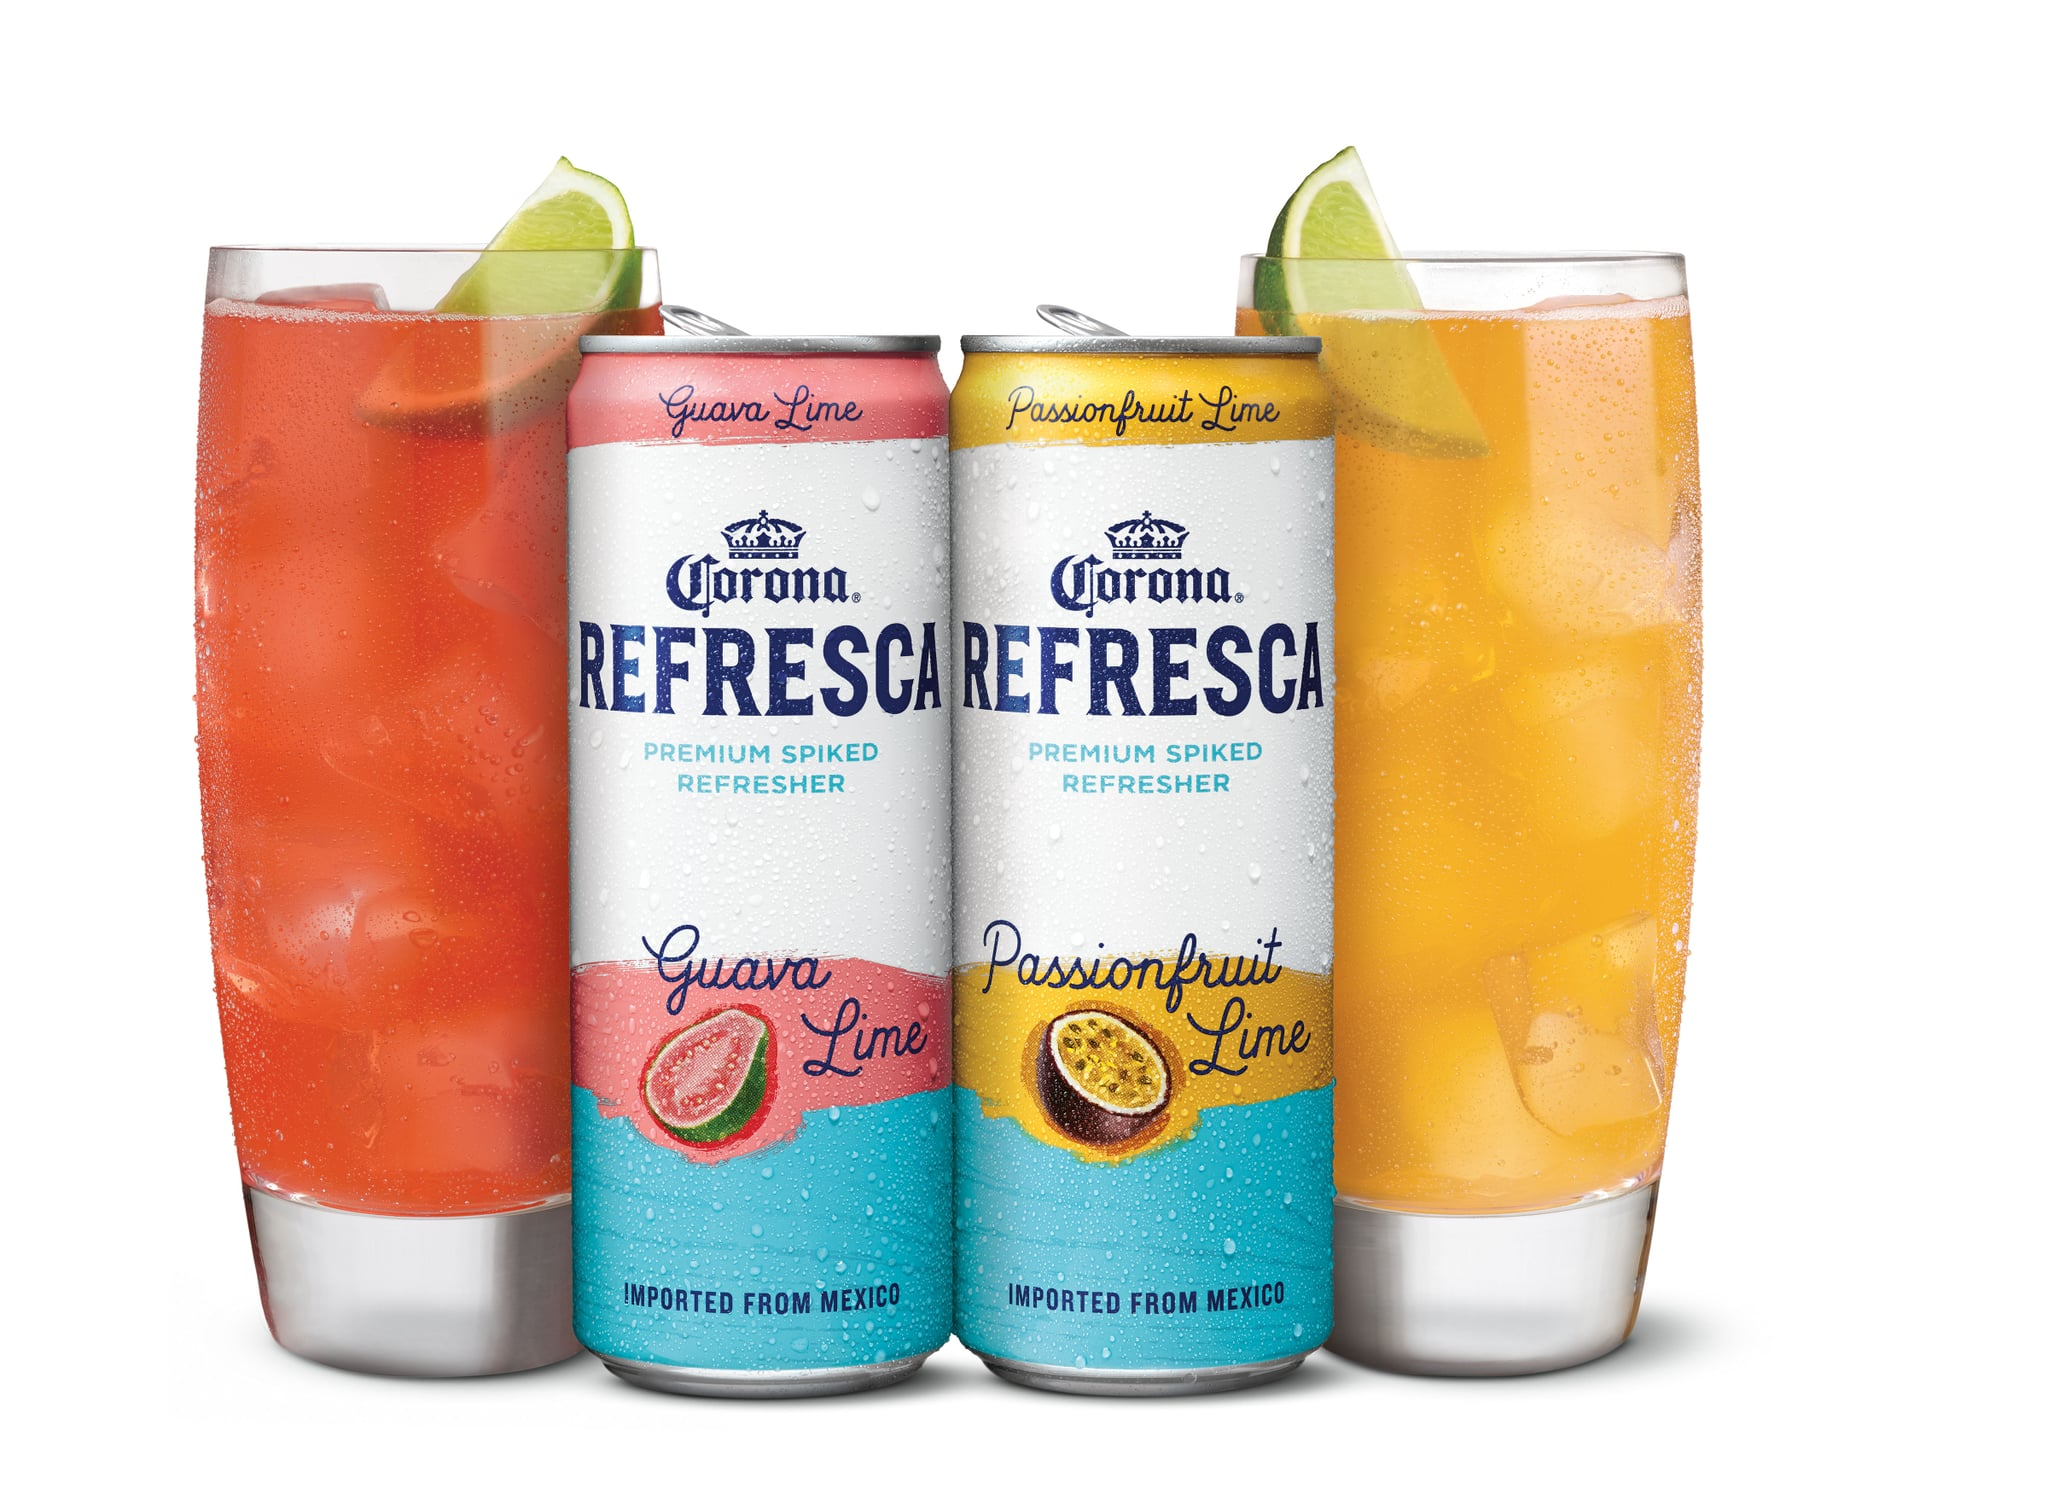 Corona Refrescas Spiked Malt Drinks Popsugar Food